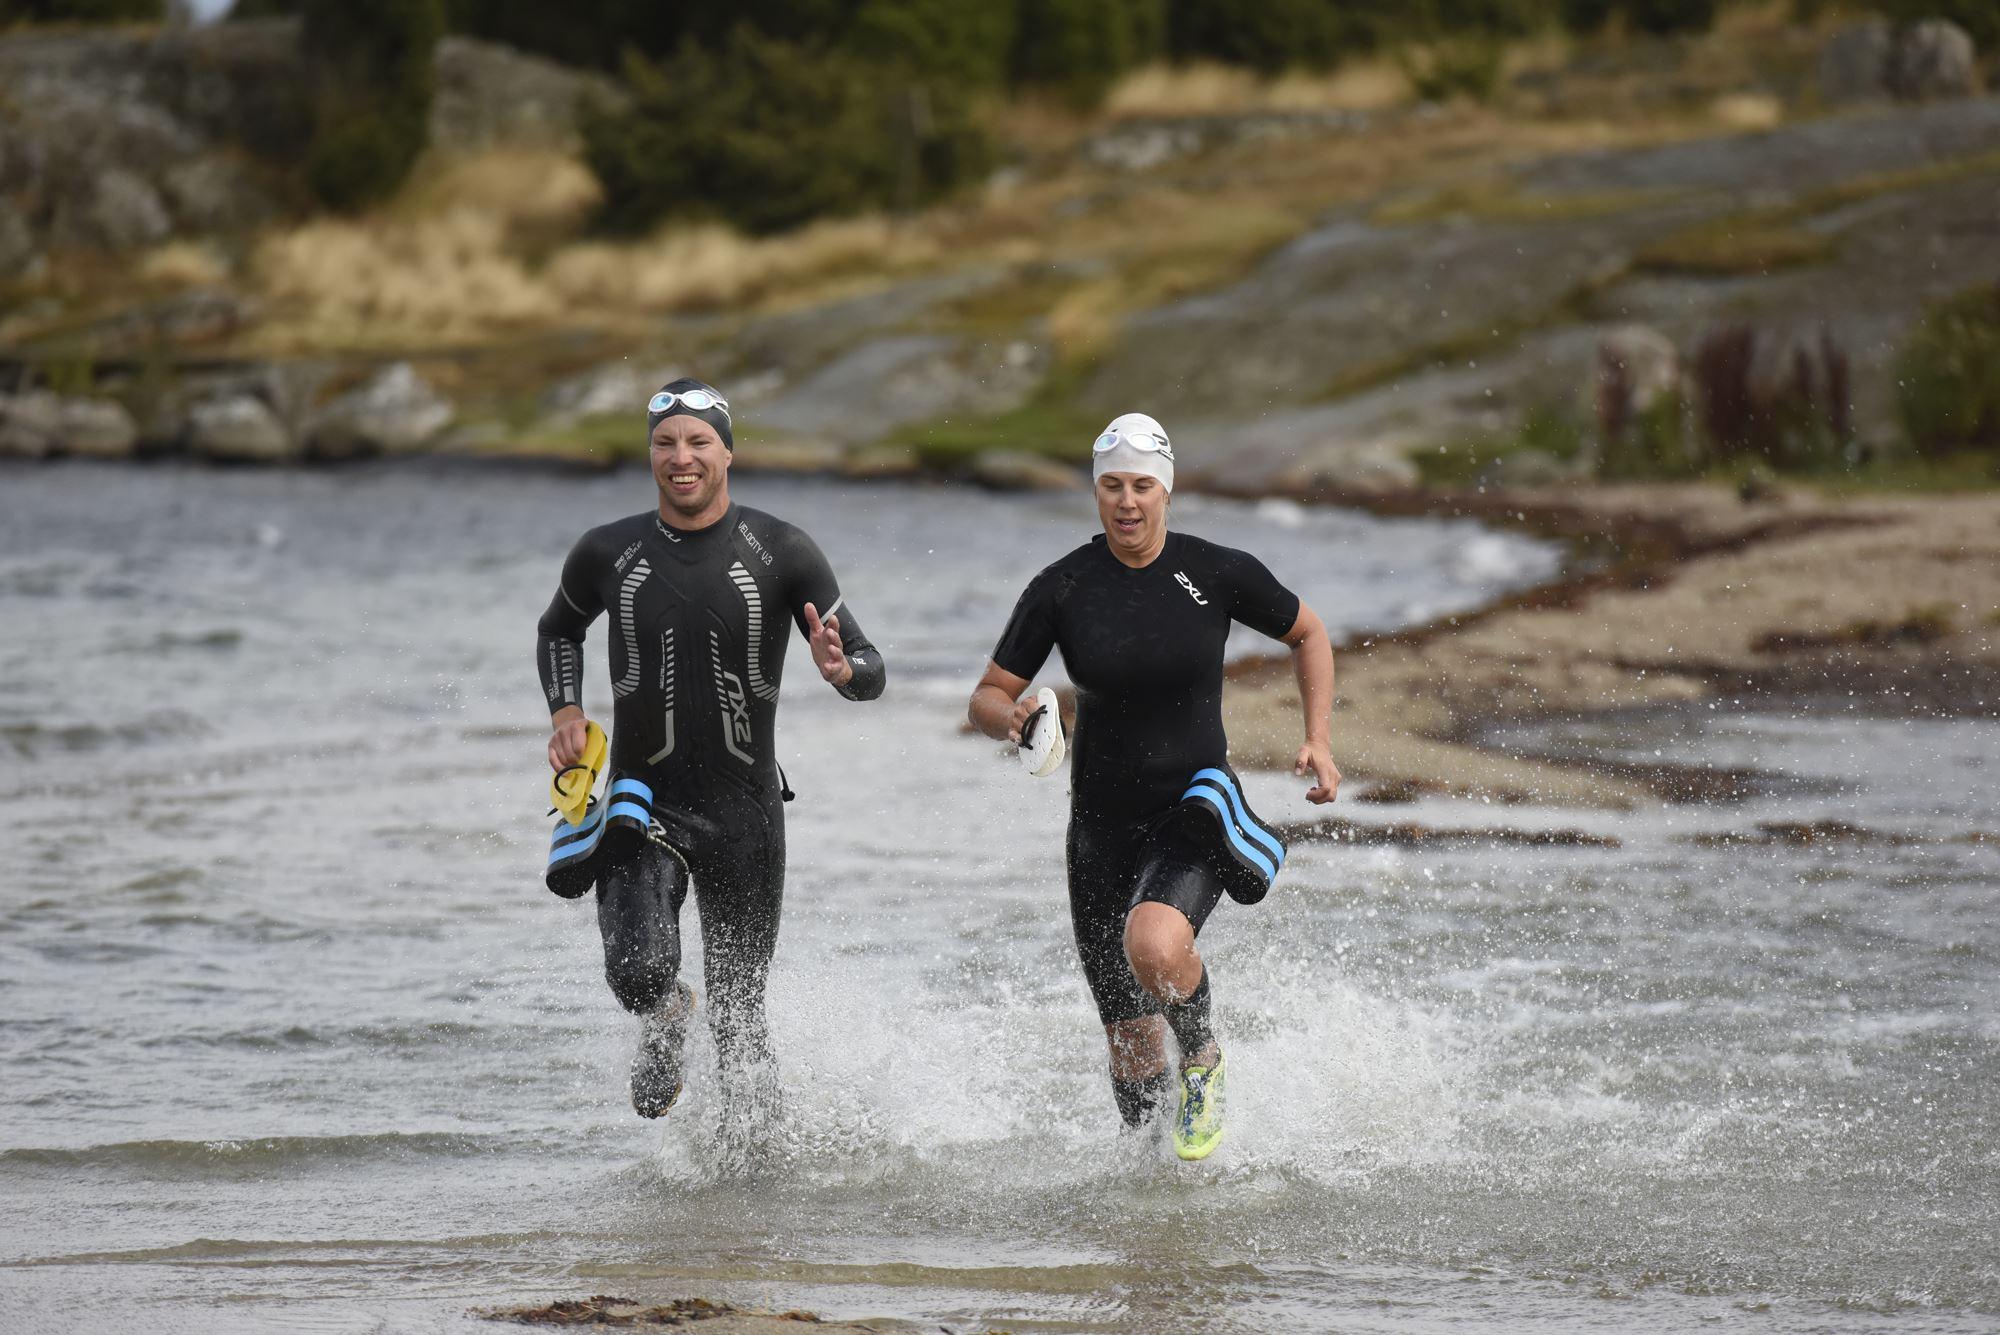 Östersjöfestivalen - 2XU Island Challenge